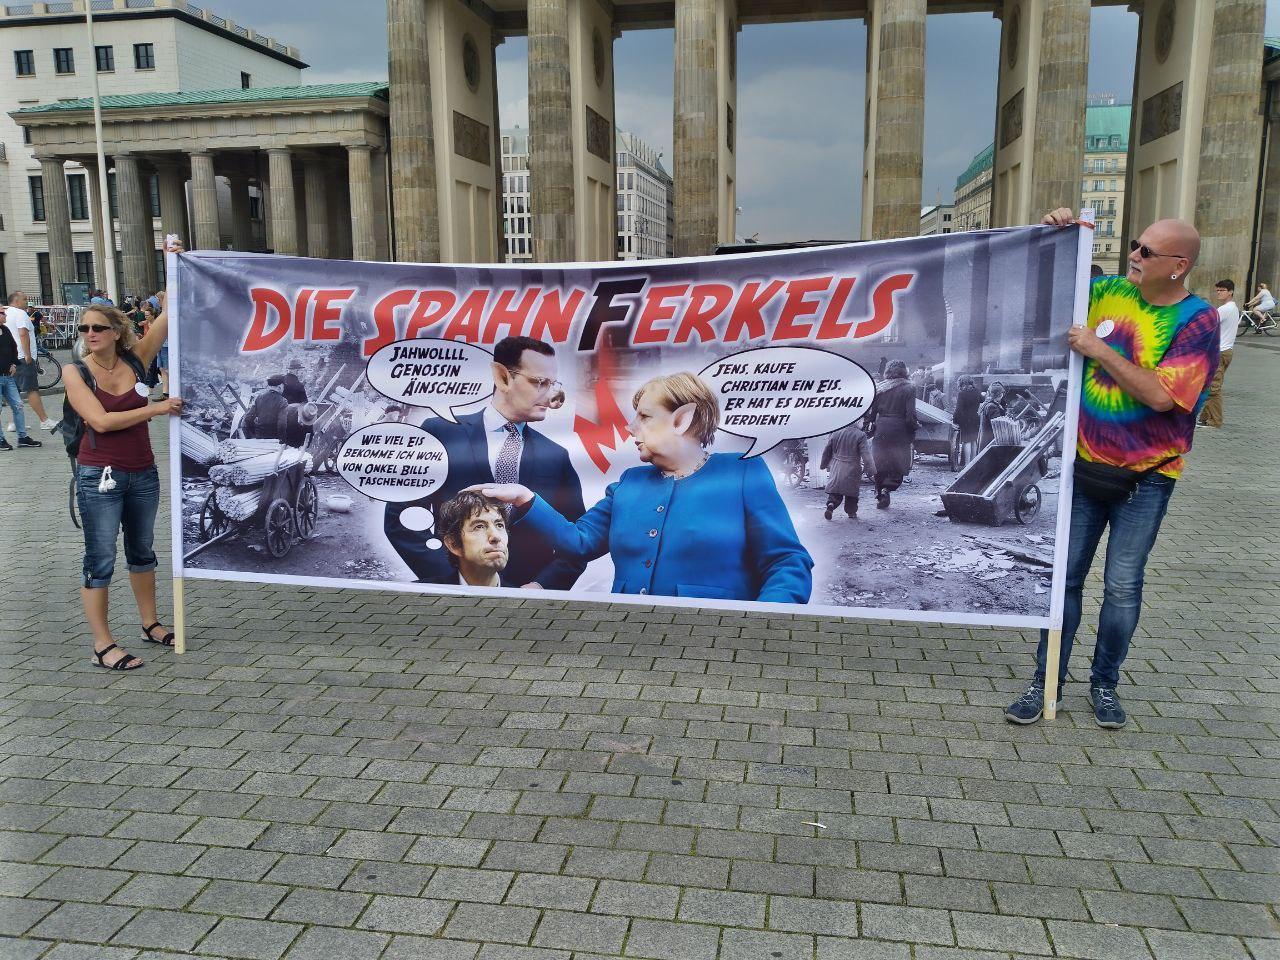 Plakat Demonstration in Berlin